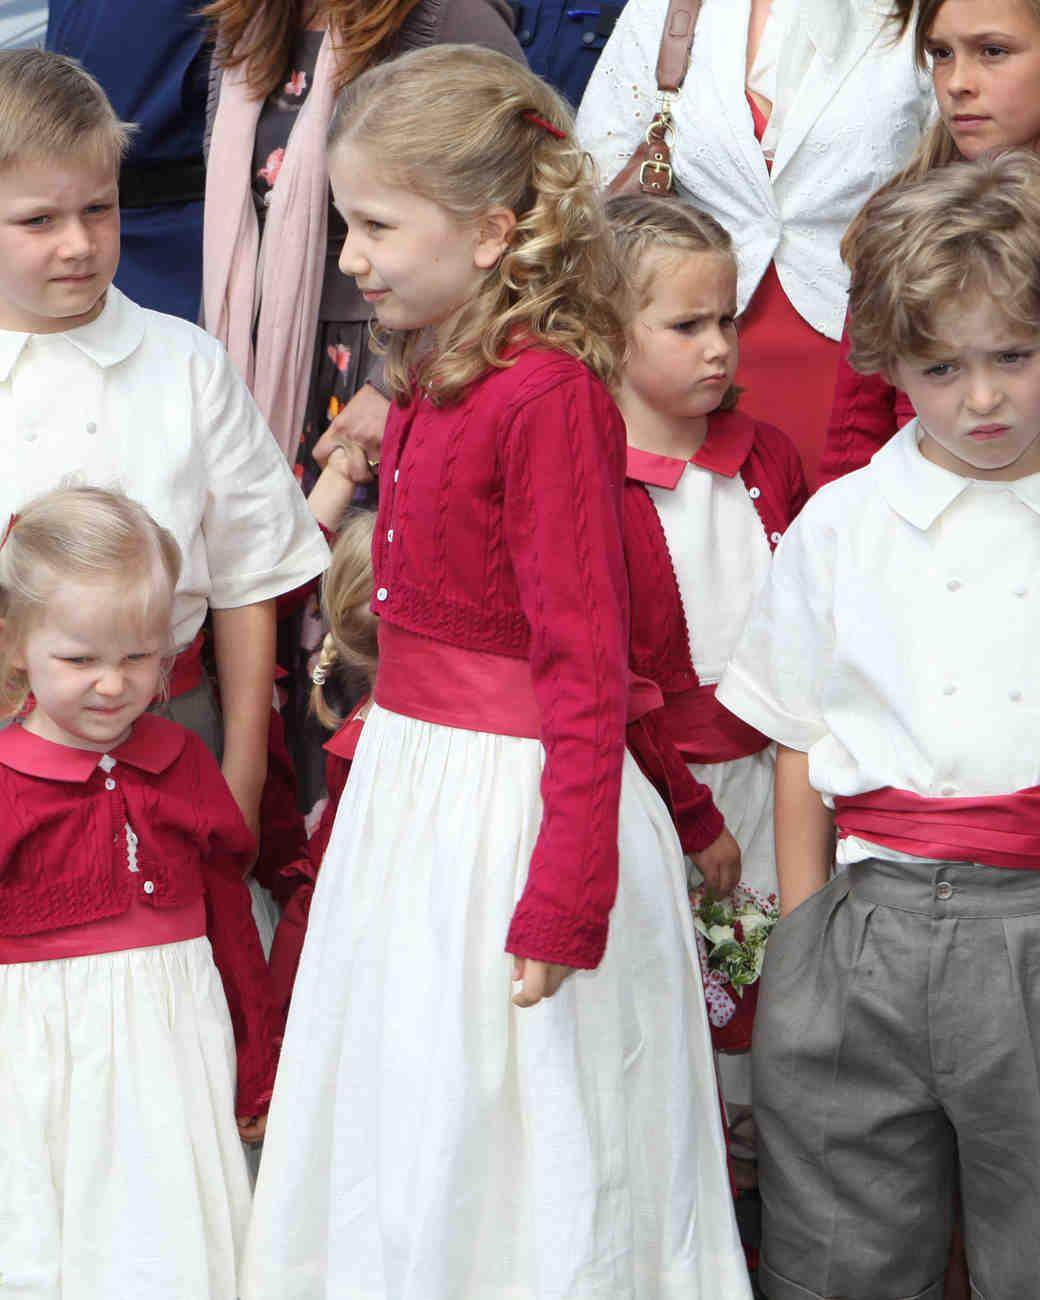 royal-children-wedding-115916262_master-0415.jpg